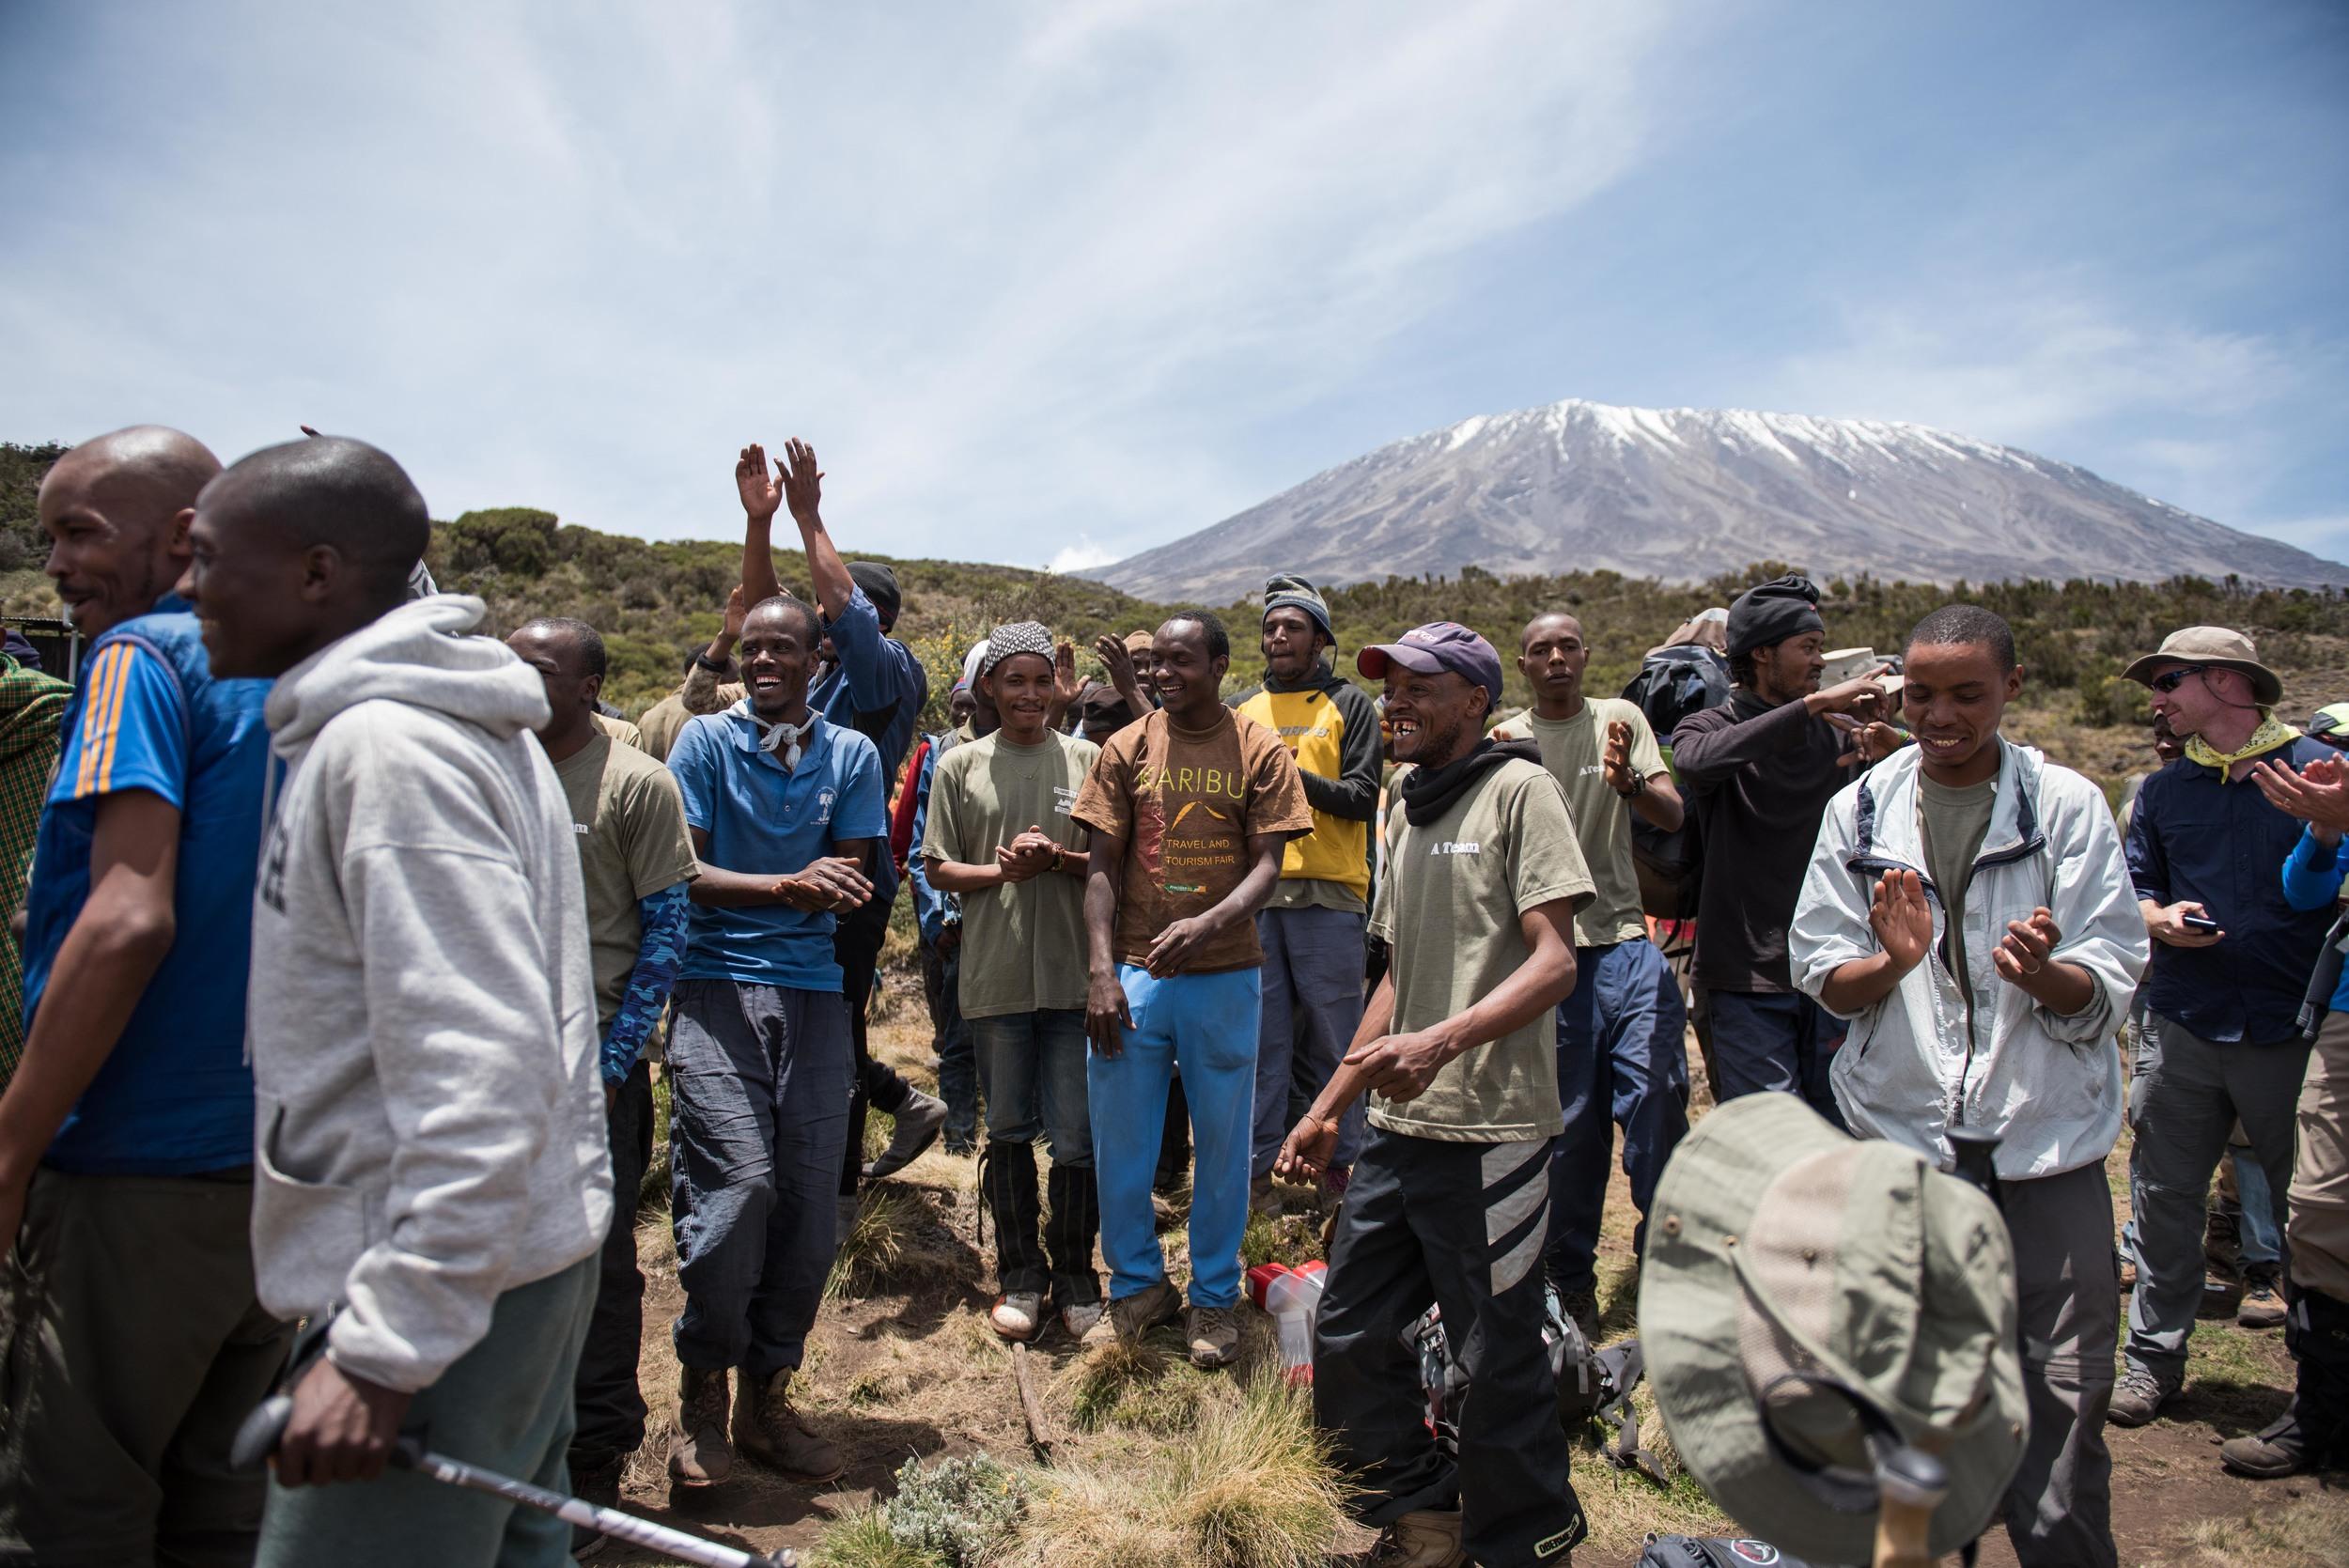 WEB_Kilimanjaro-11.jpg